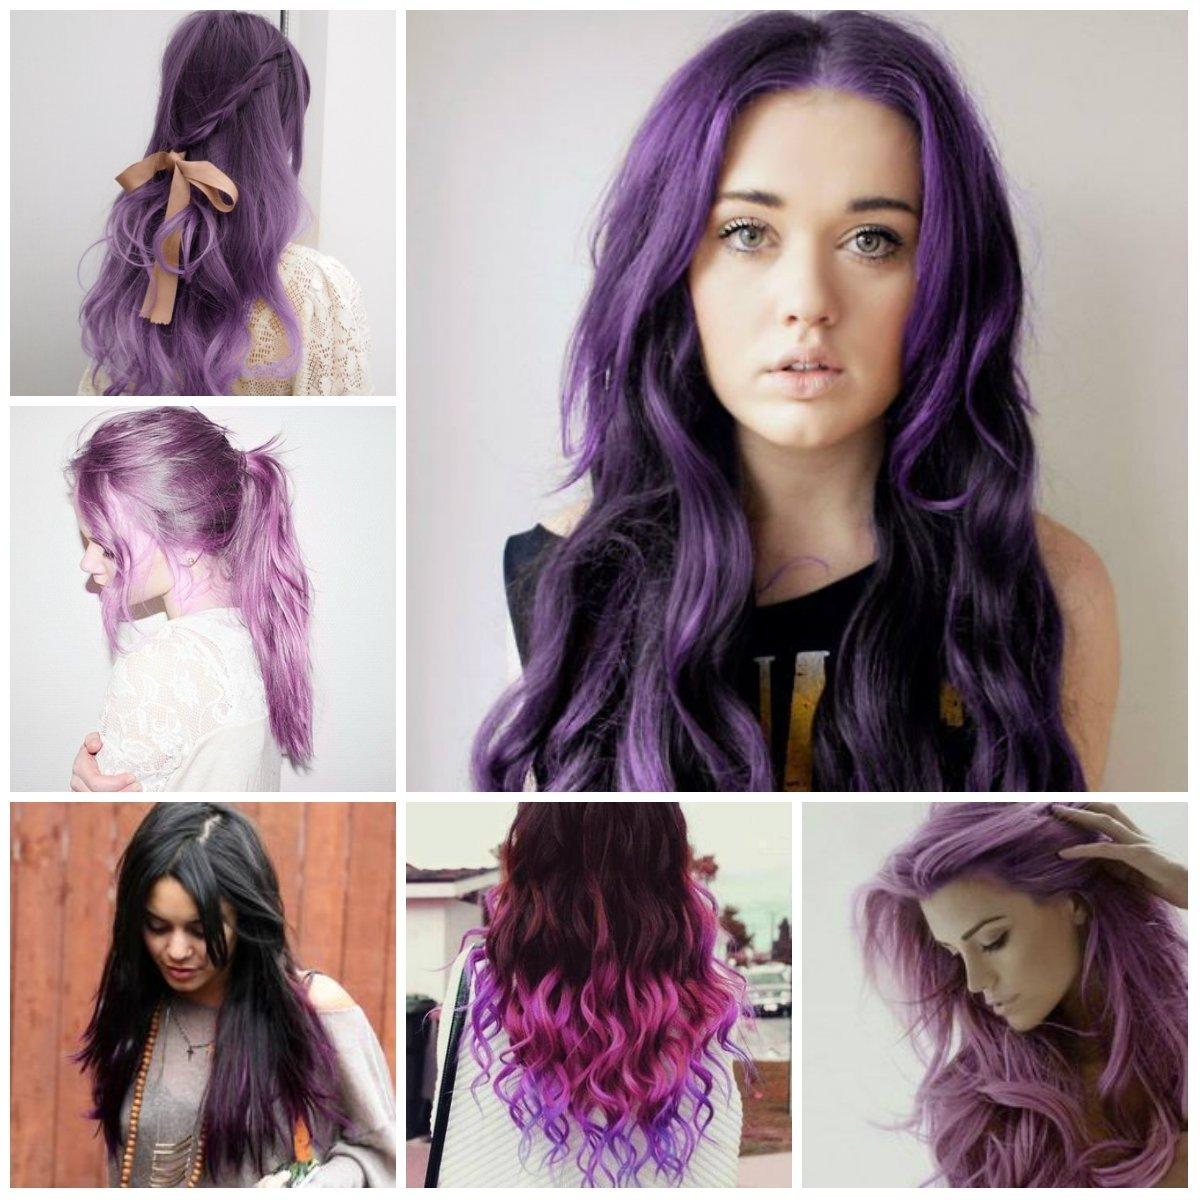 10 Attractive Cute Hair Color Ideas For Dark Hair latest hair color ideas 2016 trendy hairstyles 2015 2016 for 1 2020